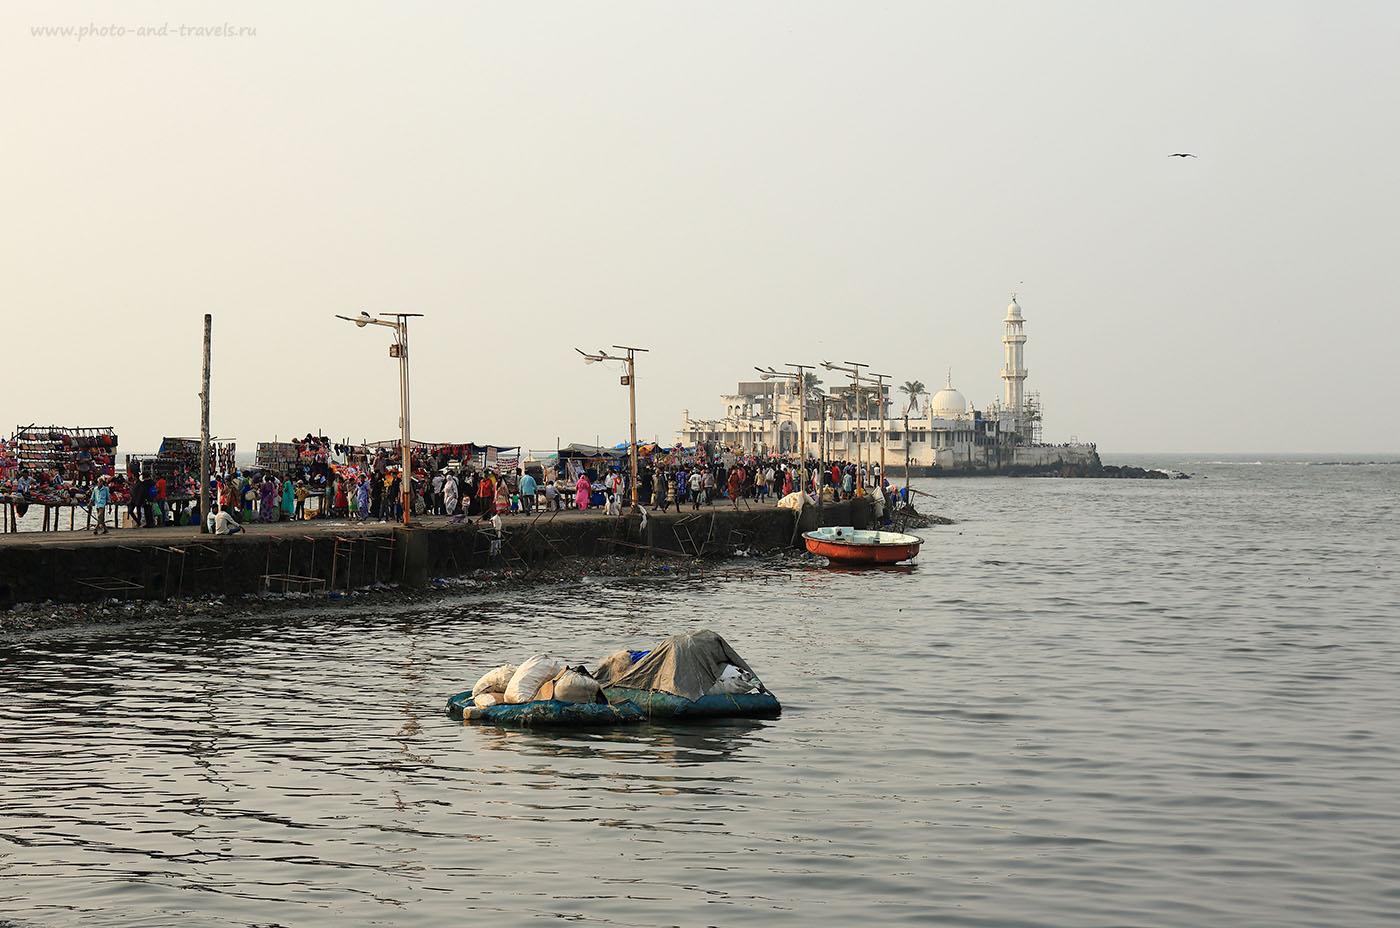 Фото № 25 Дамба, соединяющая берег с островом-мечетью Хаджи Али в Мумбаи. (24-70, 1/320, -1eV, f9, 70 mm, ISO 100)